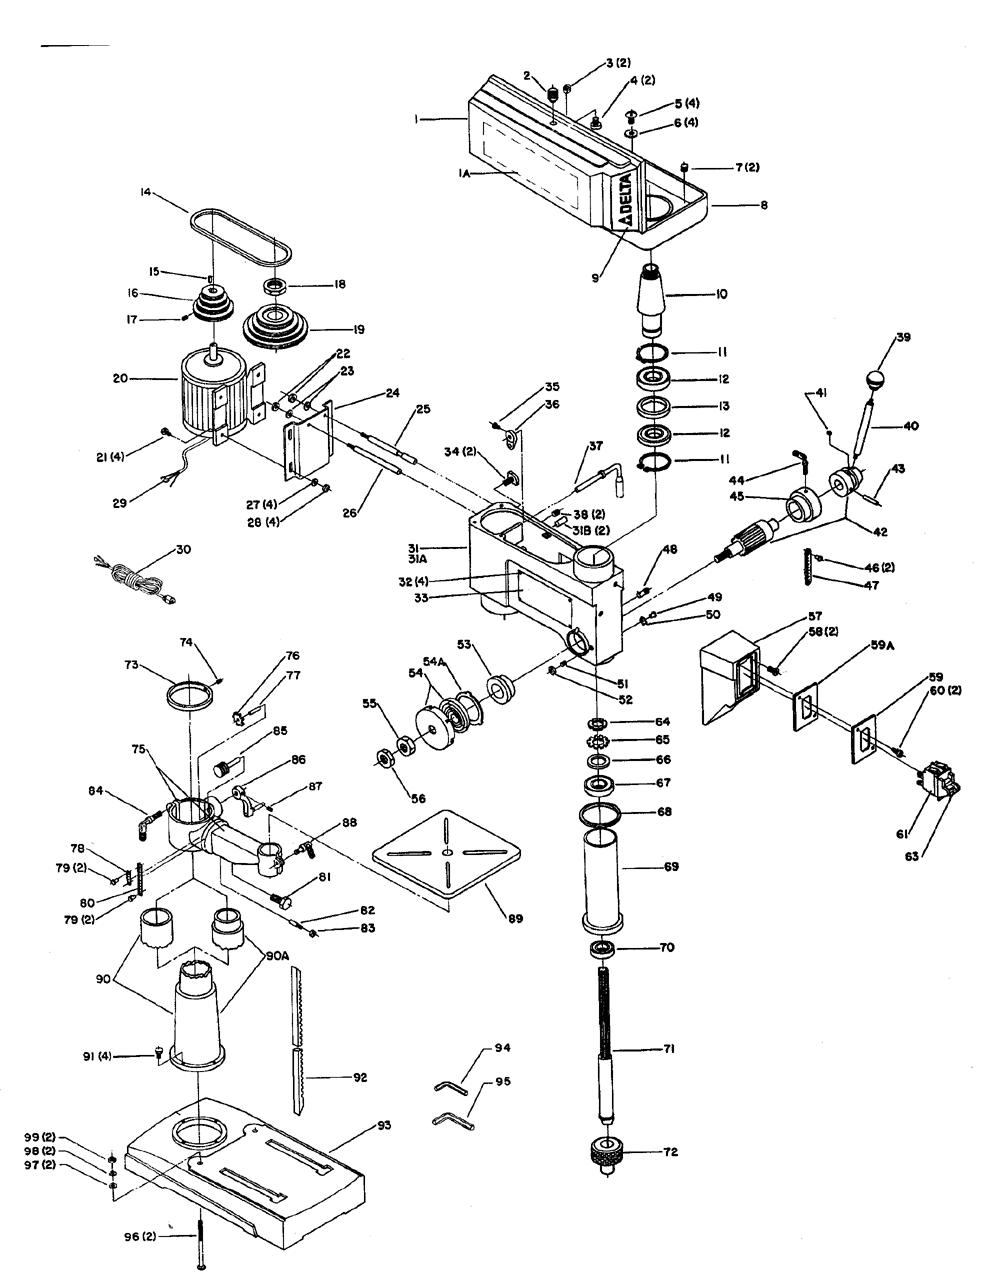 hight resolution of  drill press schematics wiring diagrams cks on drill press cabinet drill press lubrication system